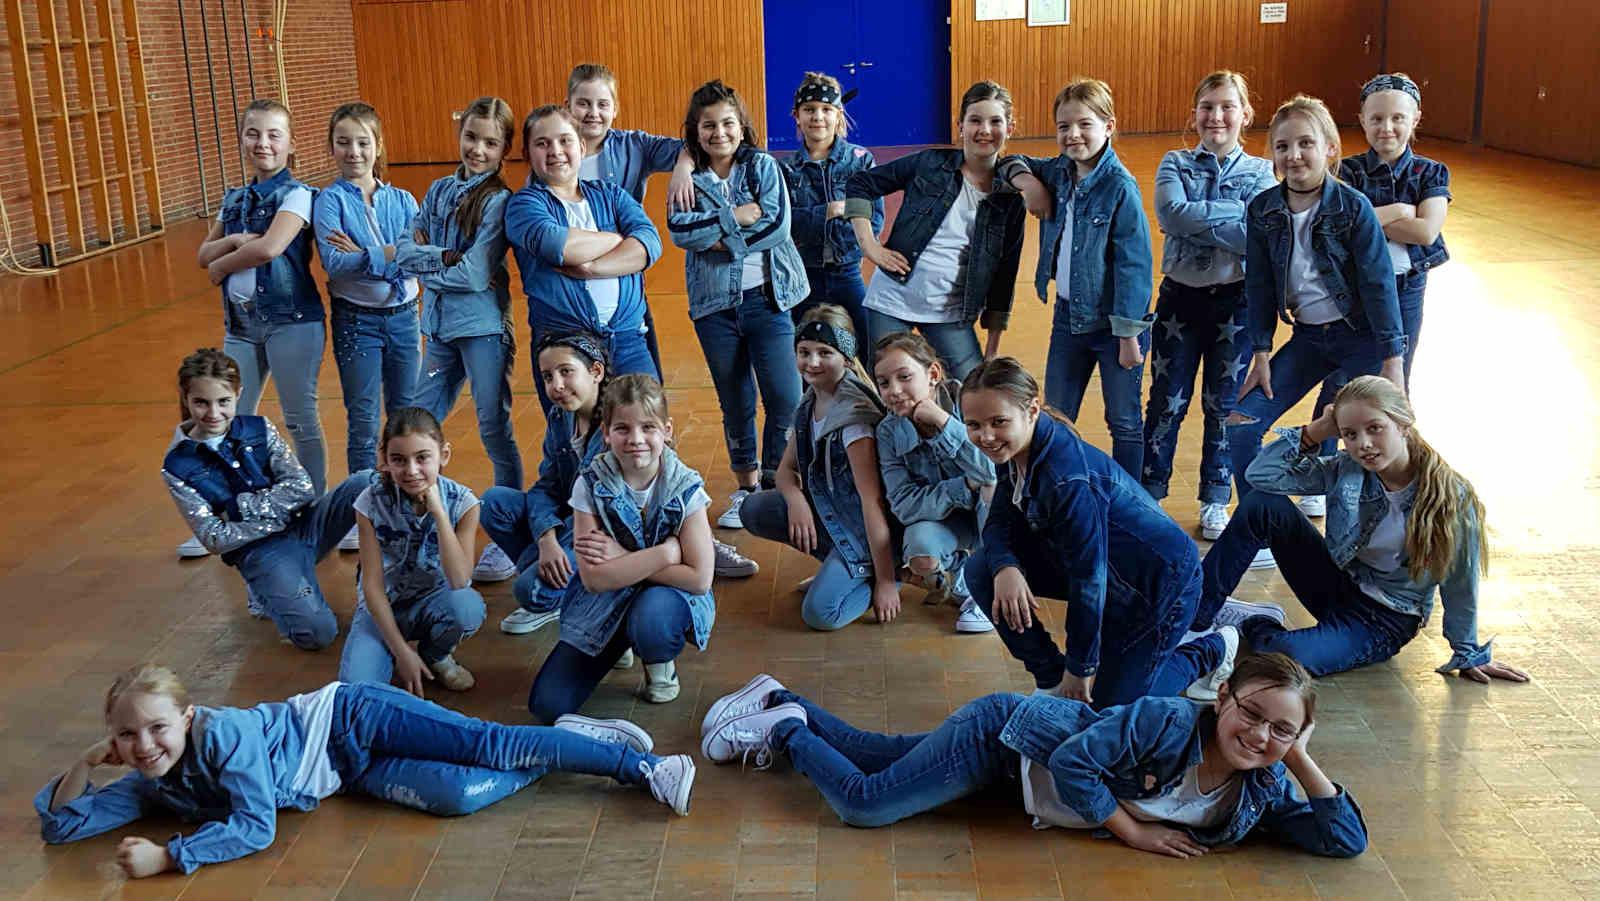 XXS Group vom TSV Sondelfingen